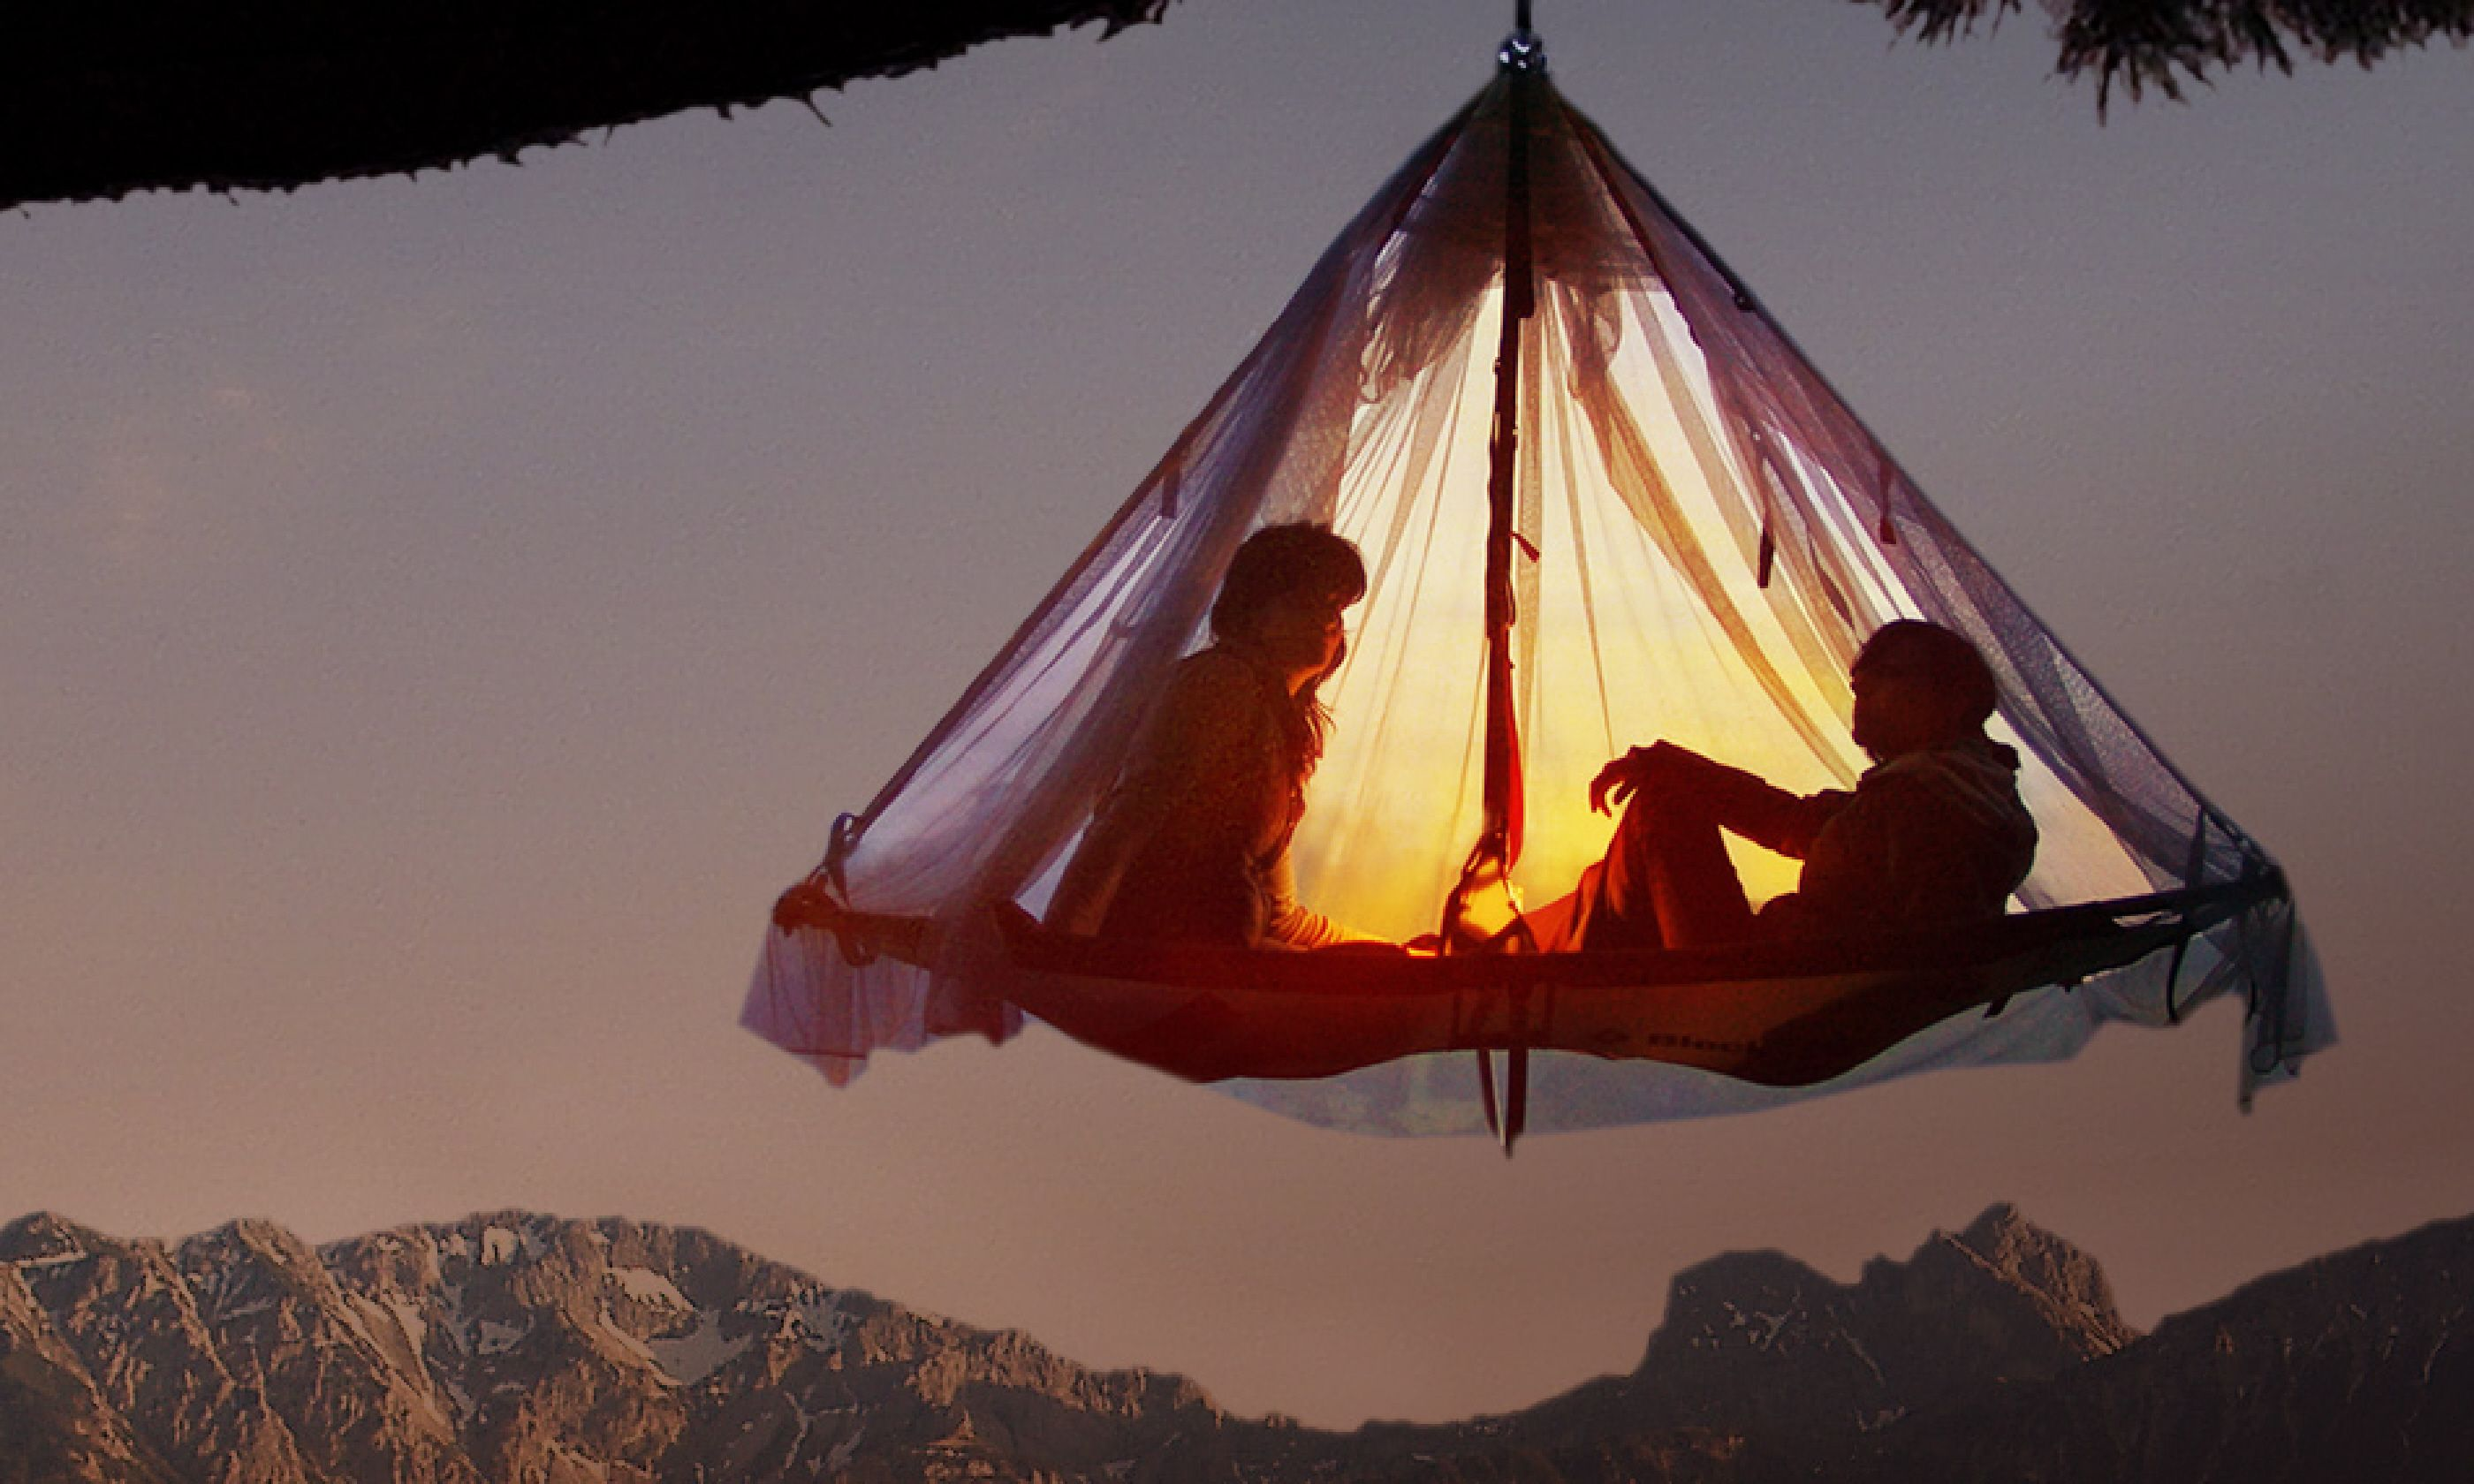 Tree camping, Waldseilgarten Hollschlucht (waldseilgarten-hoellschlucht.de)